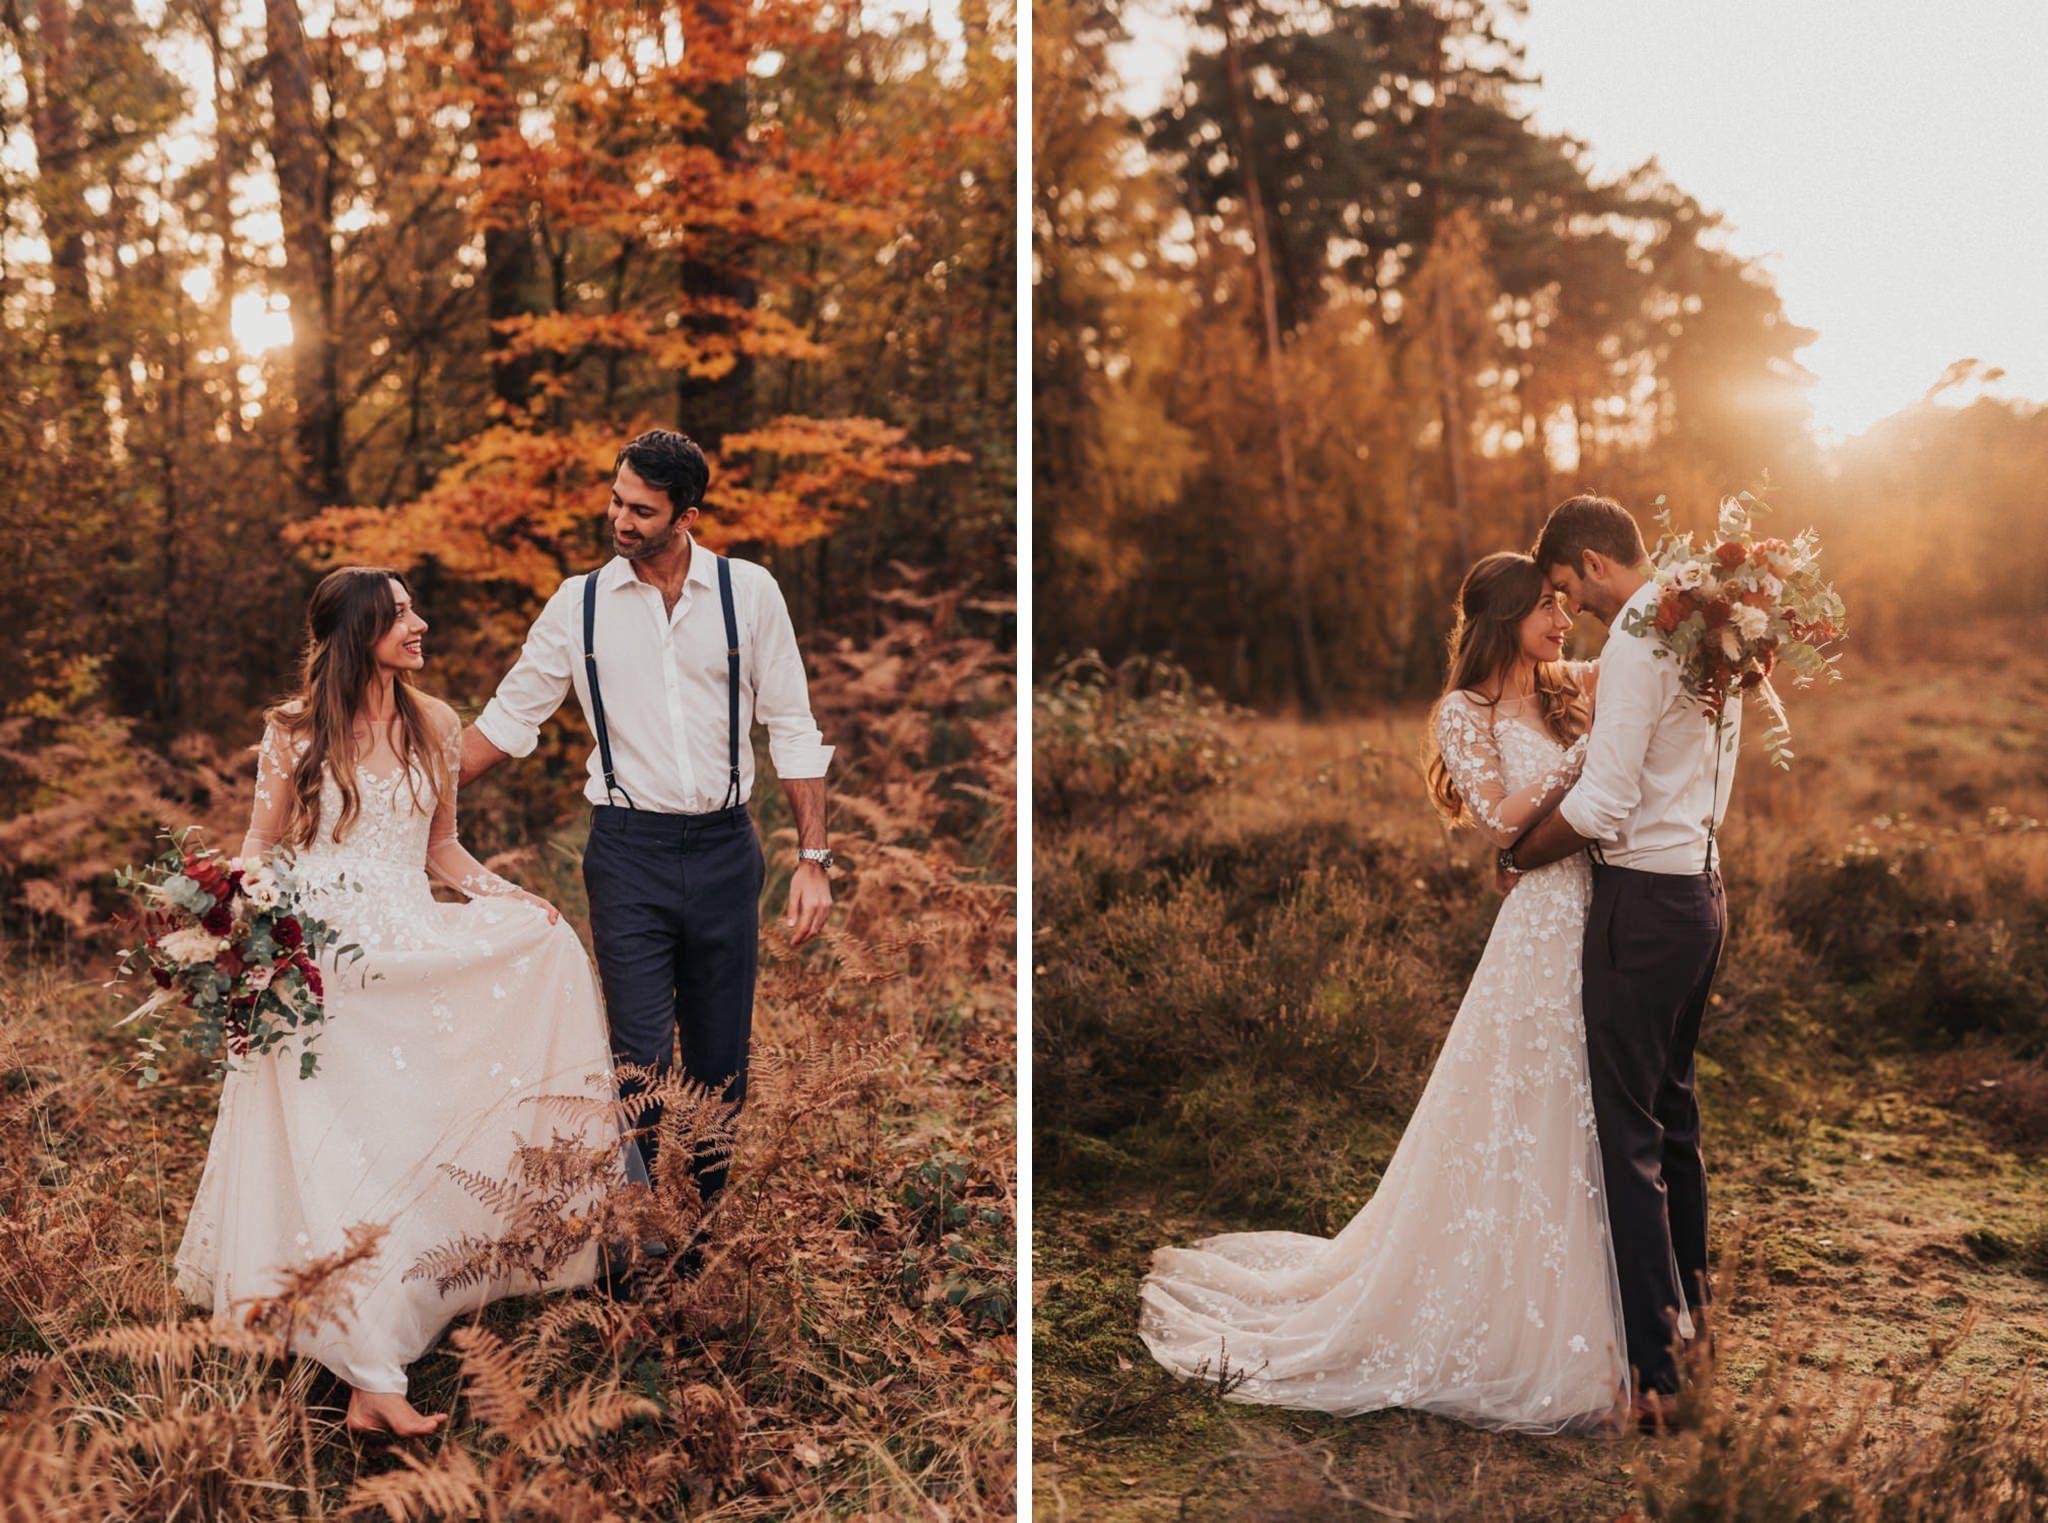 Lena Alex After Wedding Shooting In Koln Jana Stening Hochzeitsfotograf Koln Hochzeitsfotograf Nrw Hochzeit Fotografieren Hochzeit Hochzeit Bilder